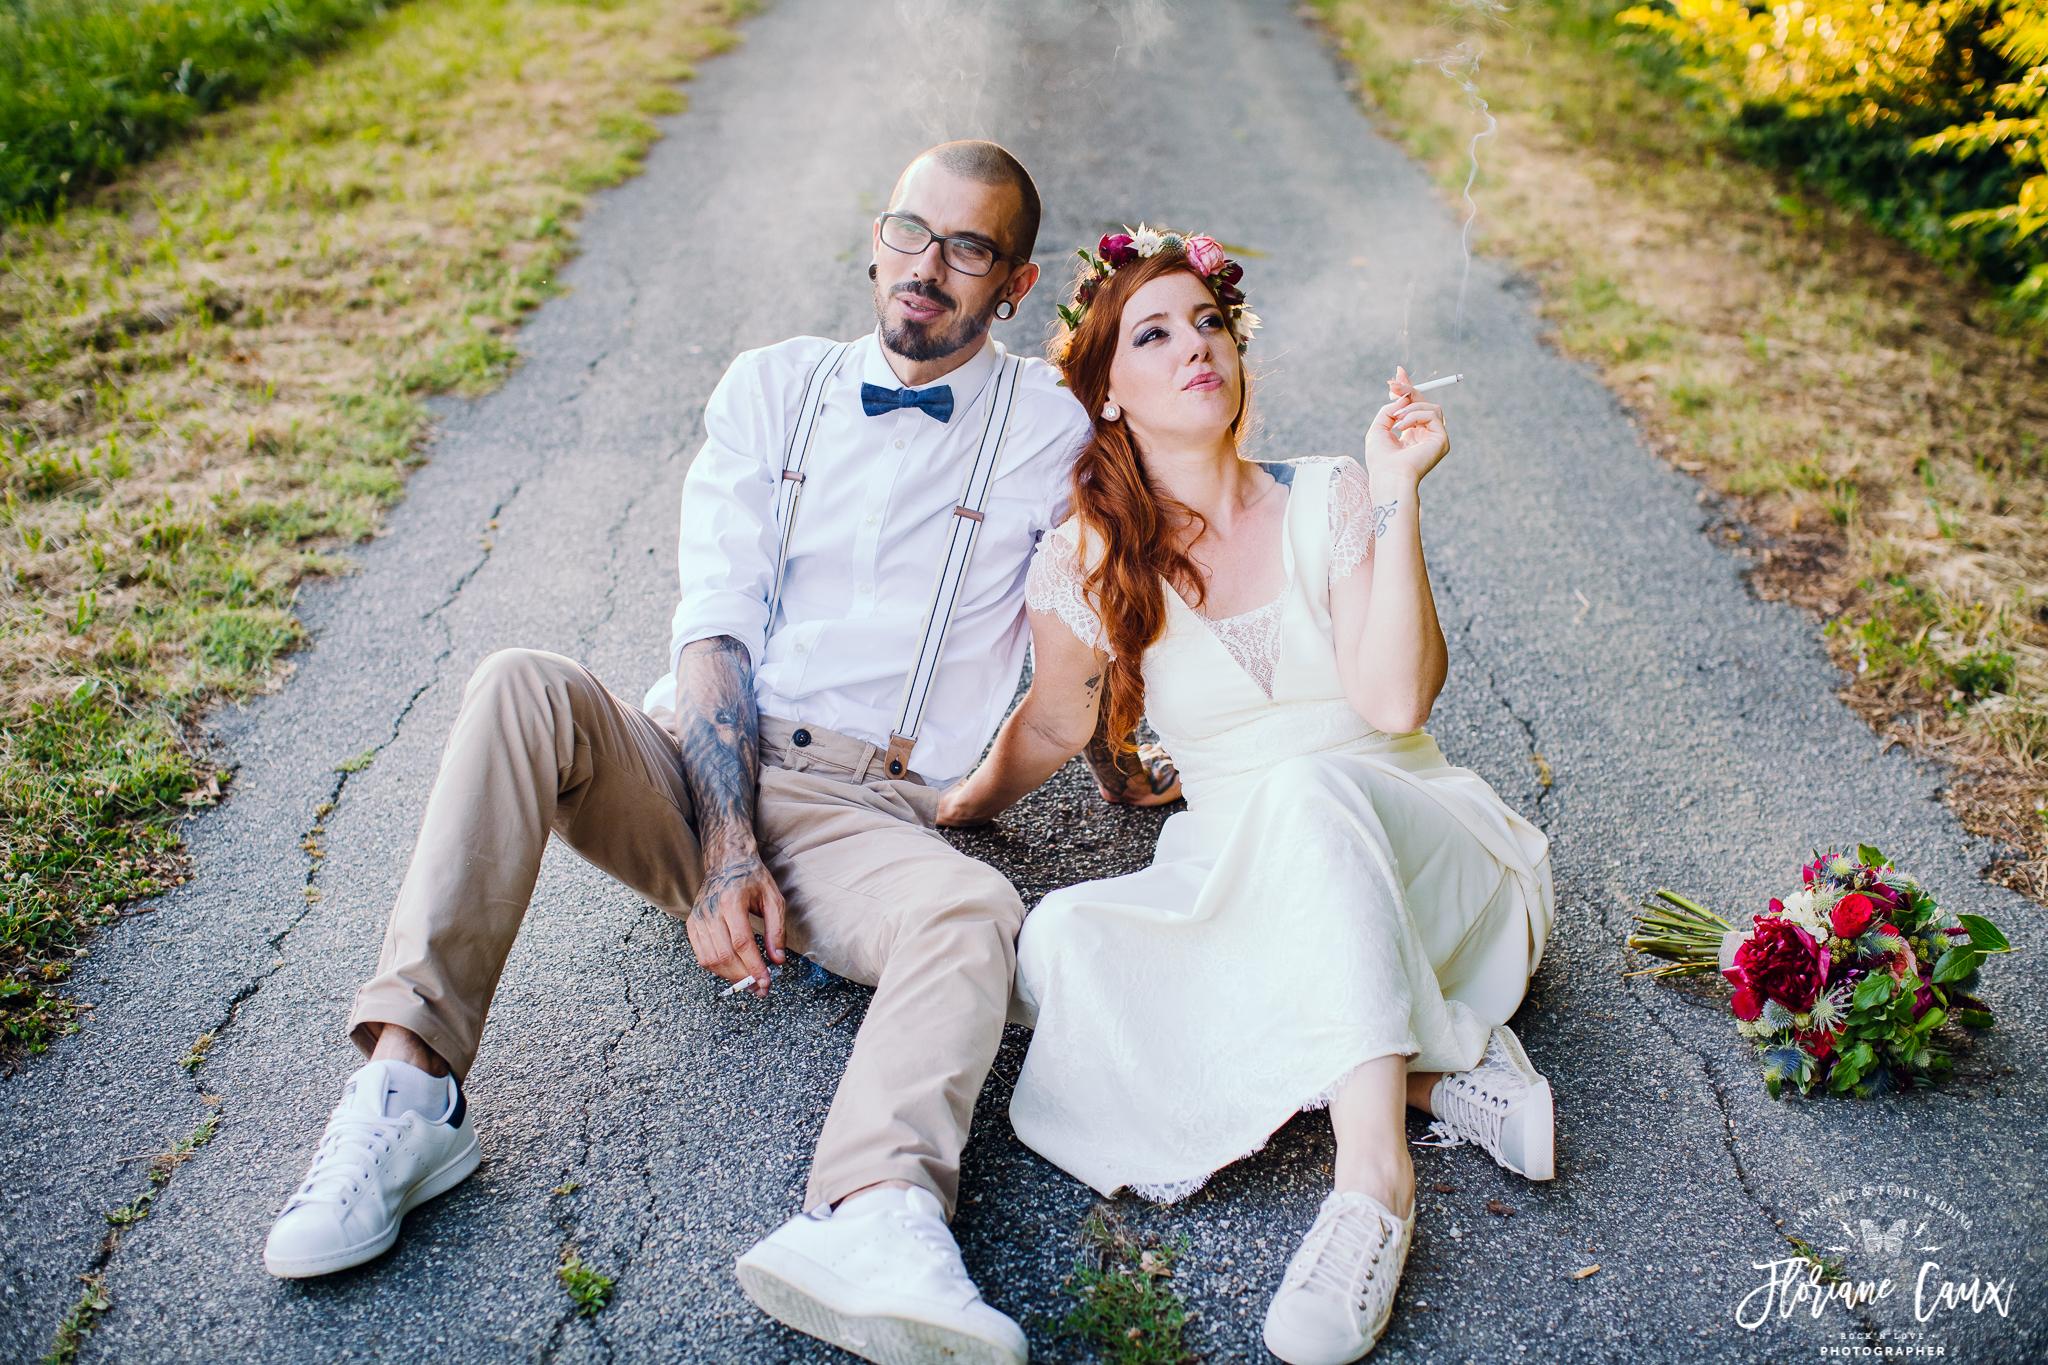 photographe-mariage-toulouse-rocknroll-maries-tatoues-floriane-caux-75